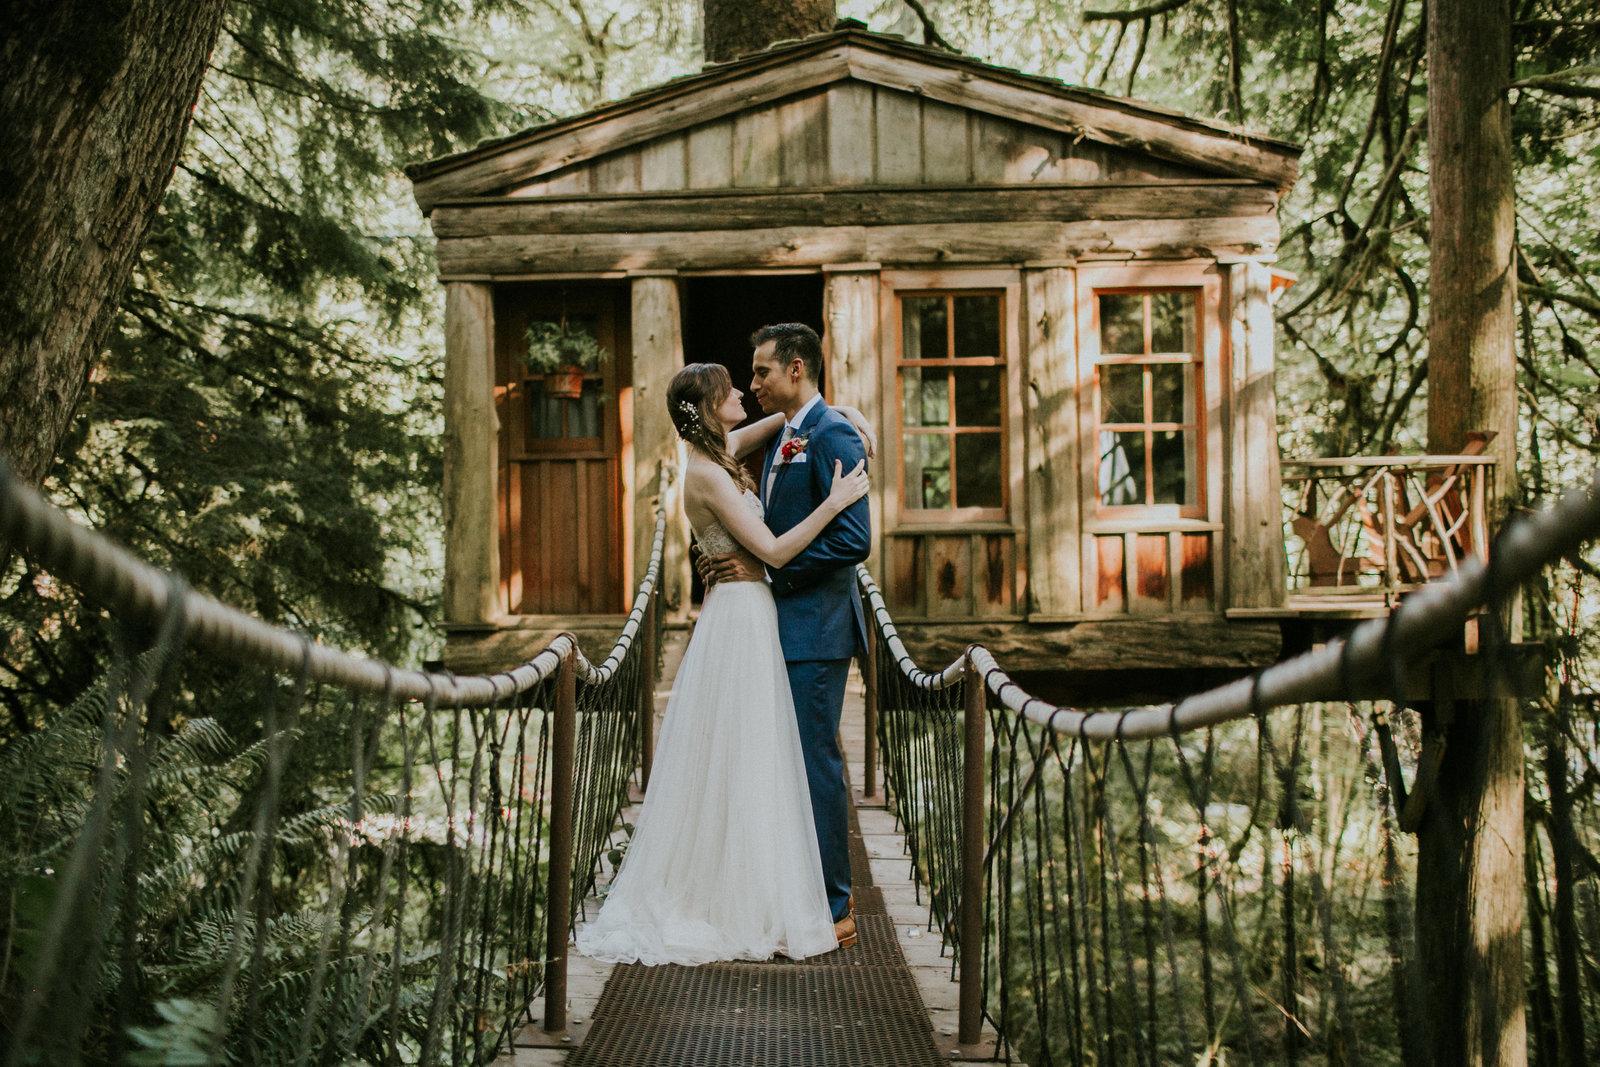 Chris laird wedding